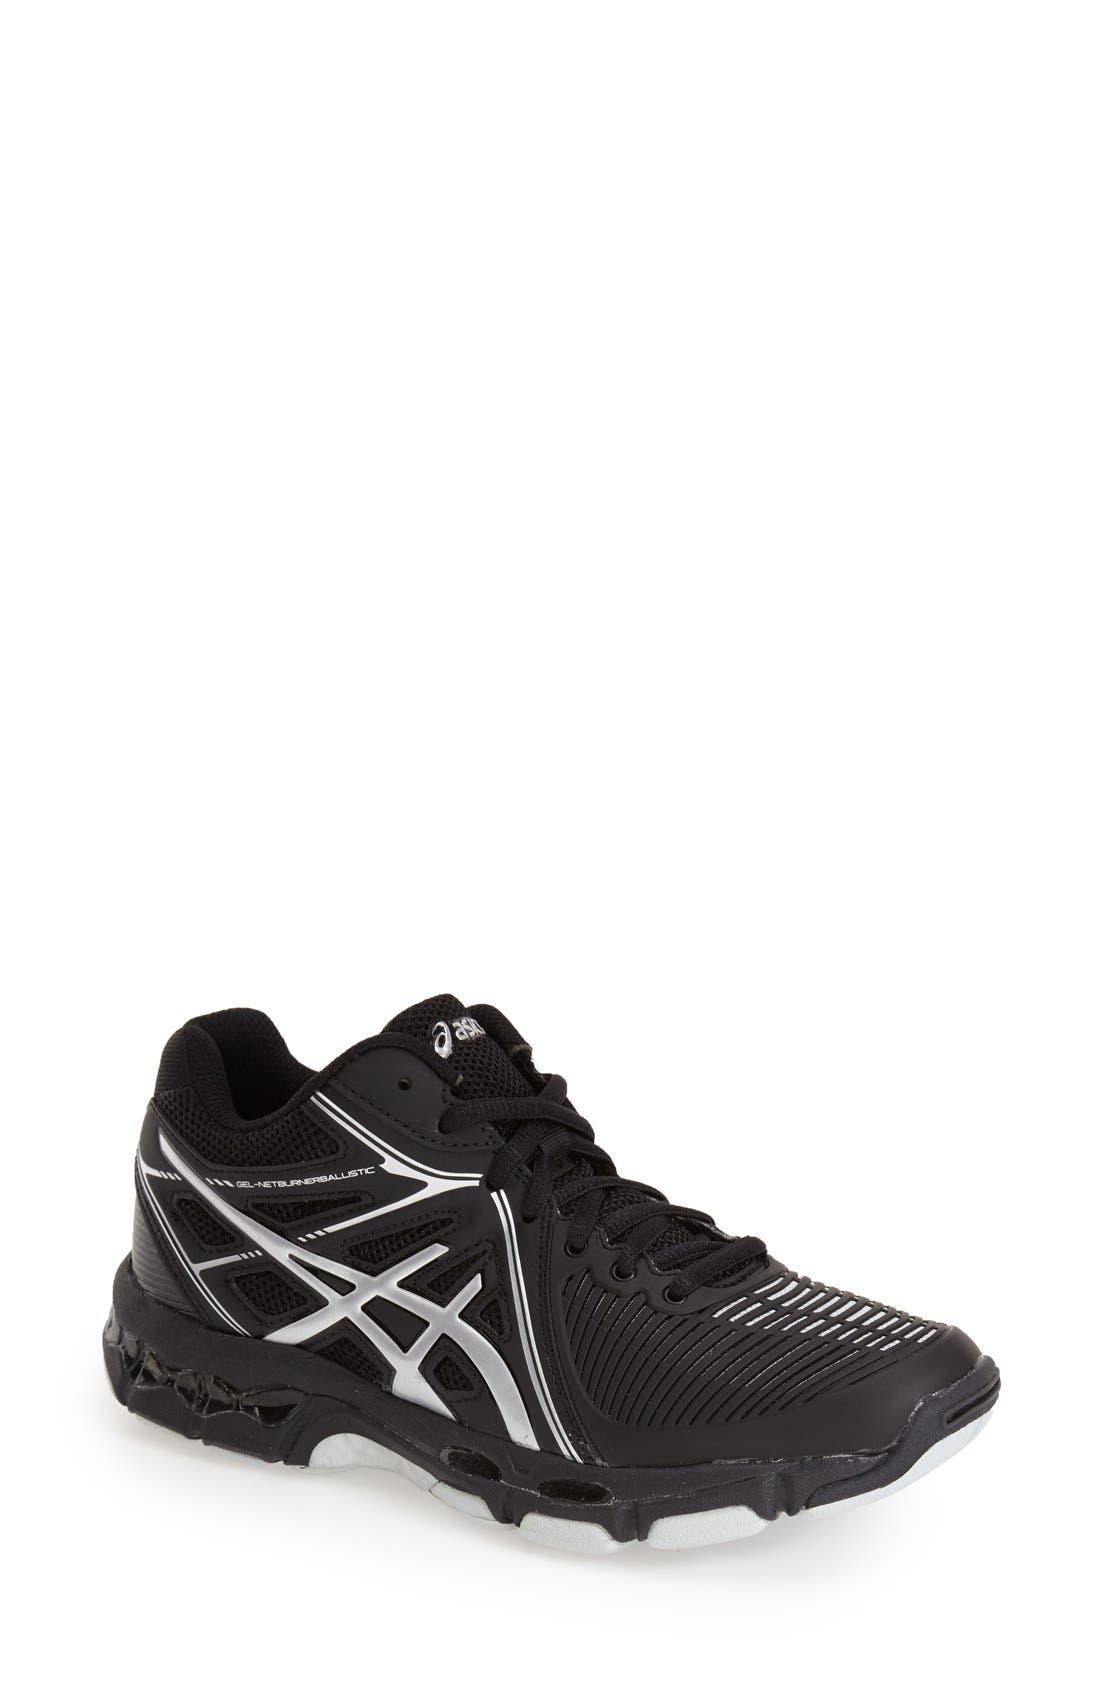 Alternate Image 1 Selected - ASICS® 'GEL-Netburner' Mid Volleyball Shoe (Women)